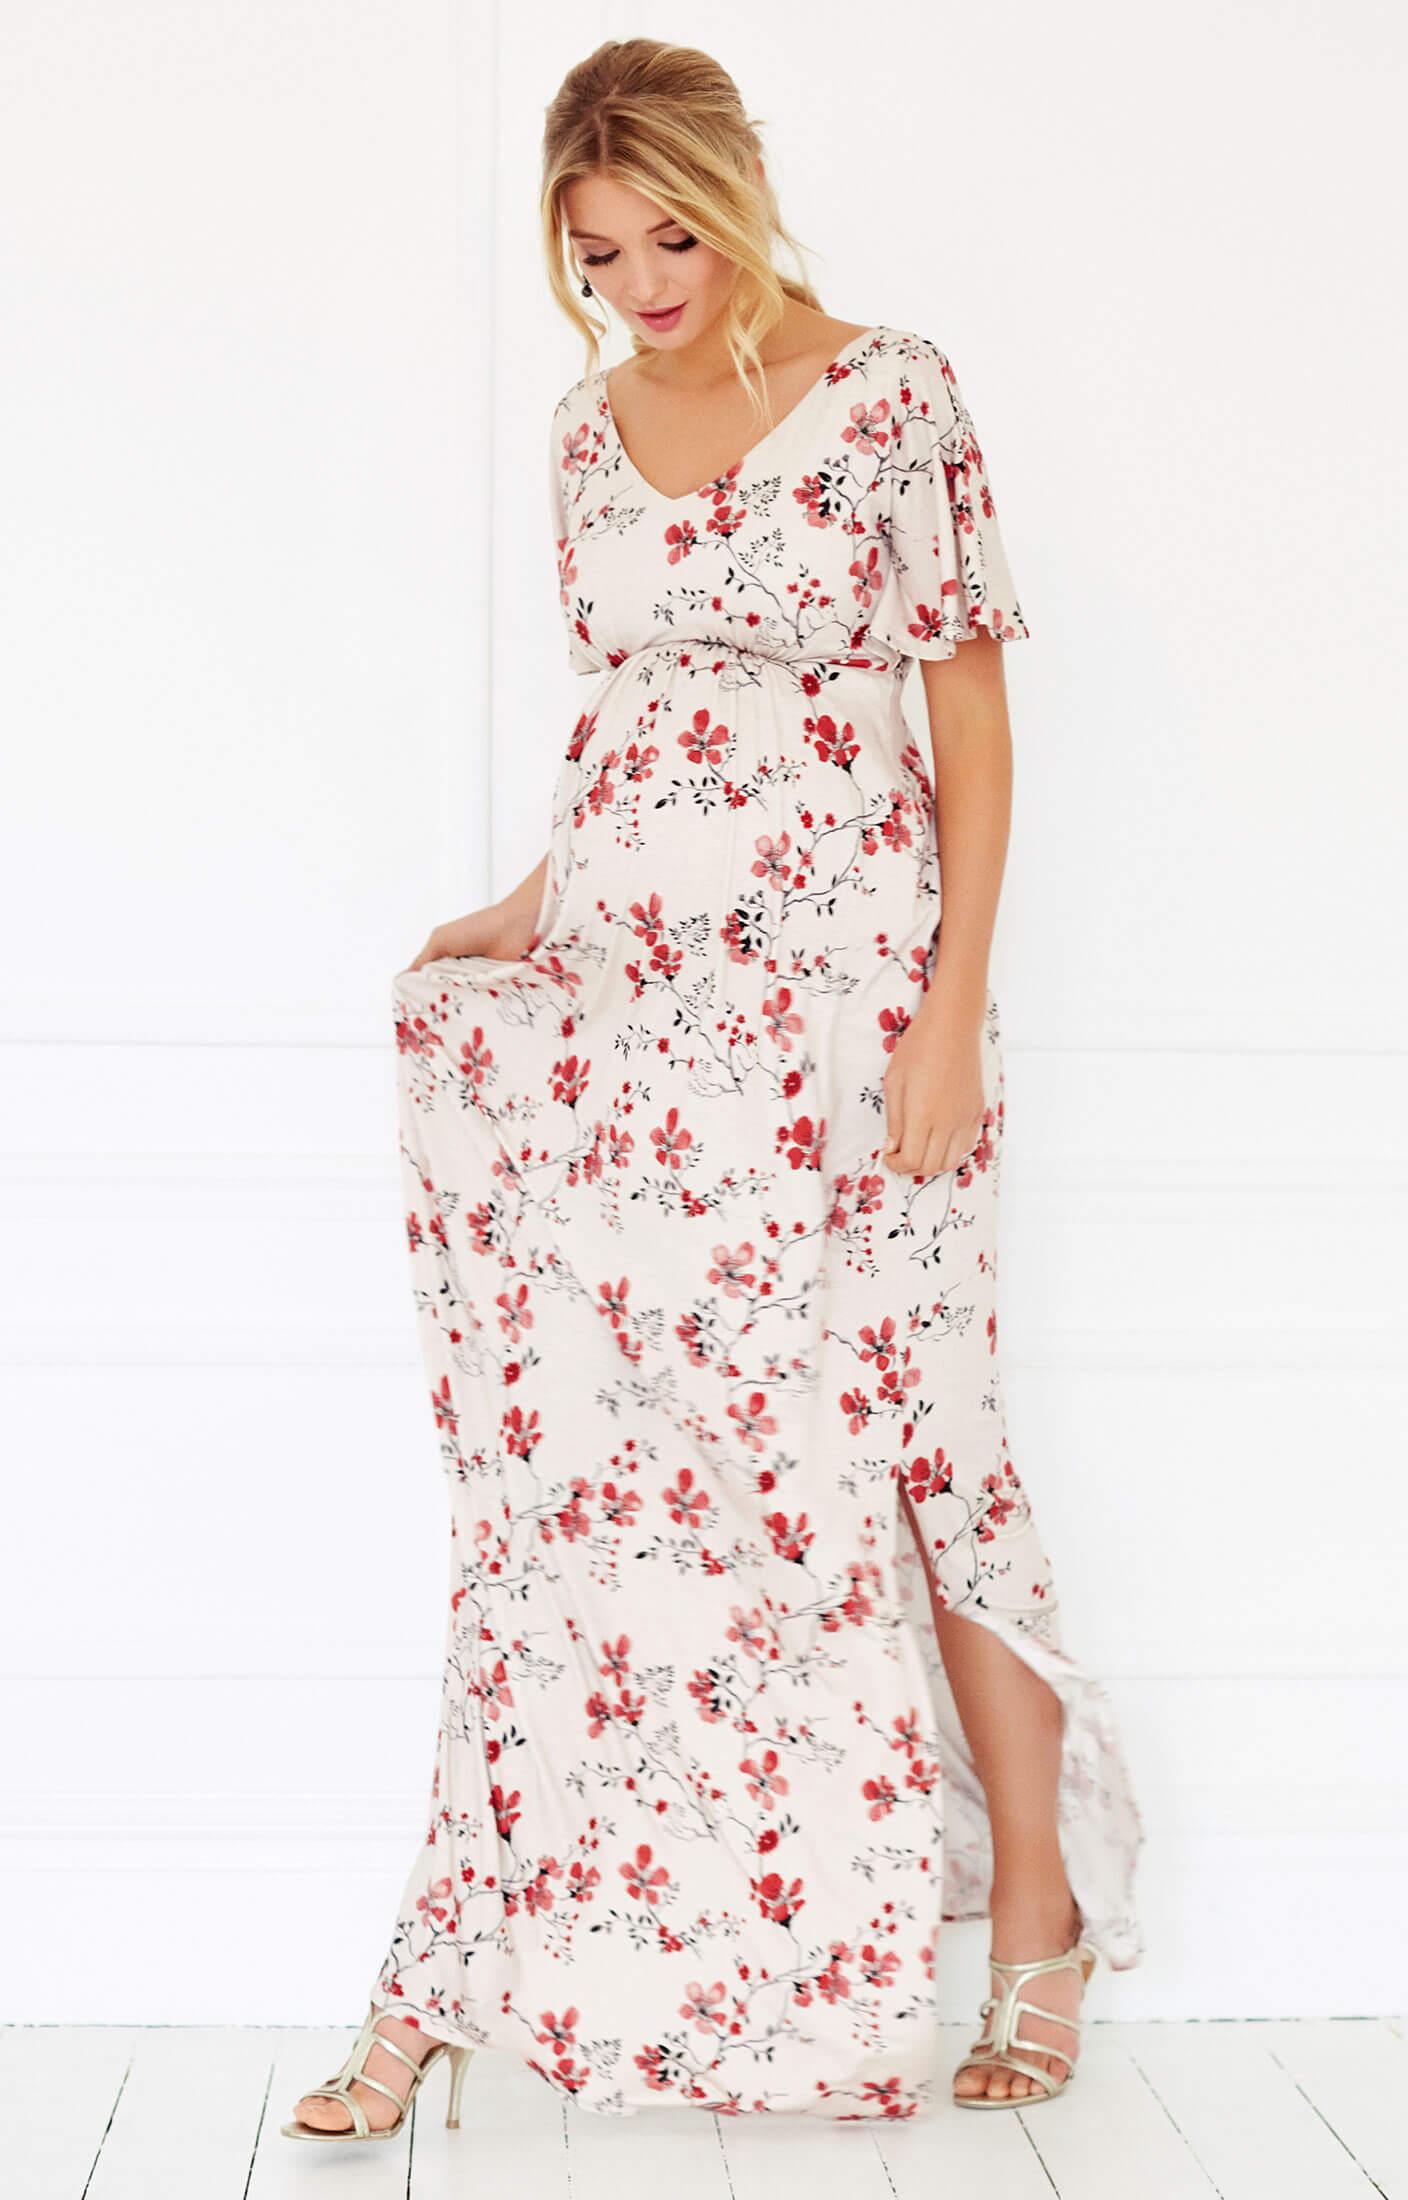 Kimono Maternity Maxi Dress Cherry Blossom Red - Maternity Wedding ...